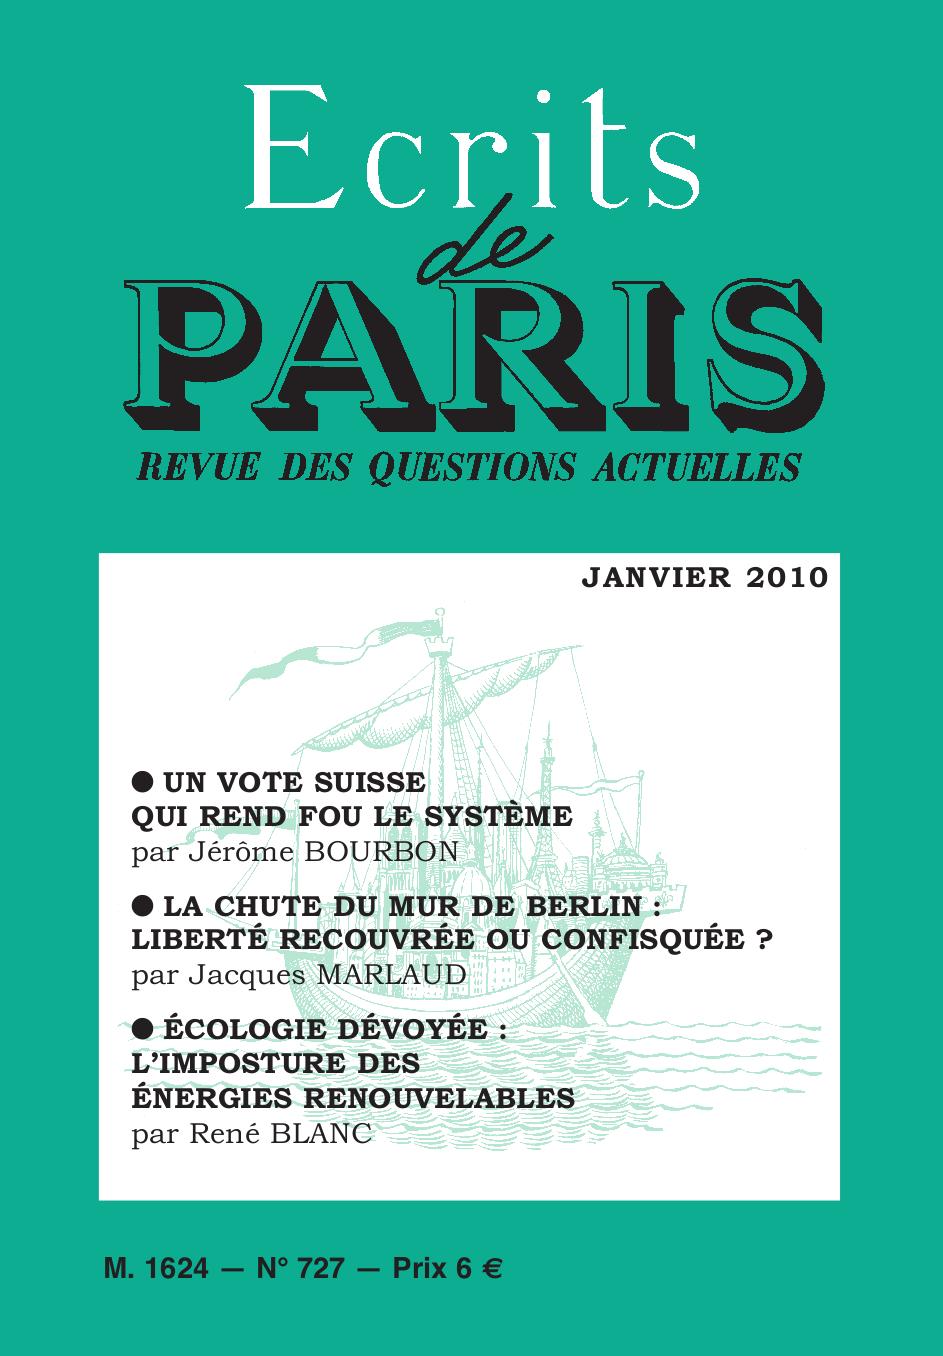 janvier 2010